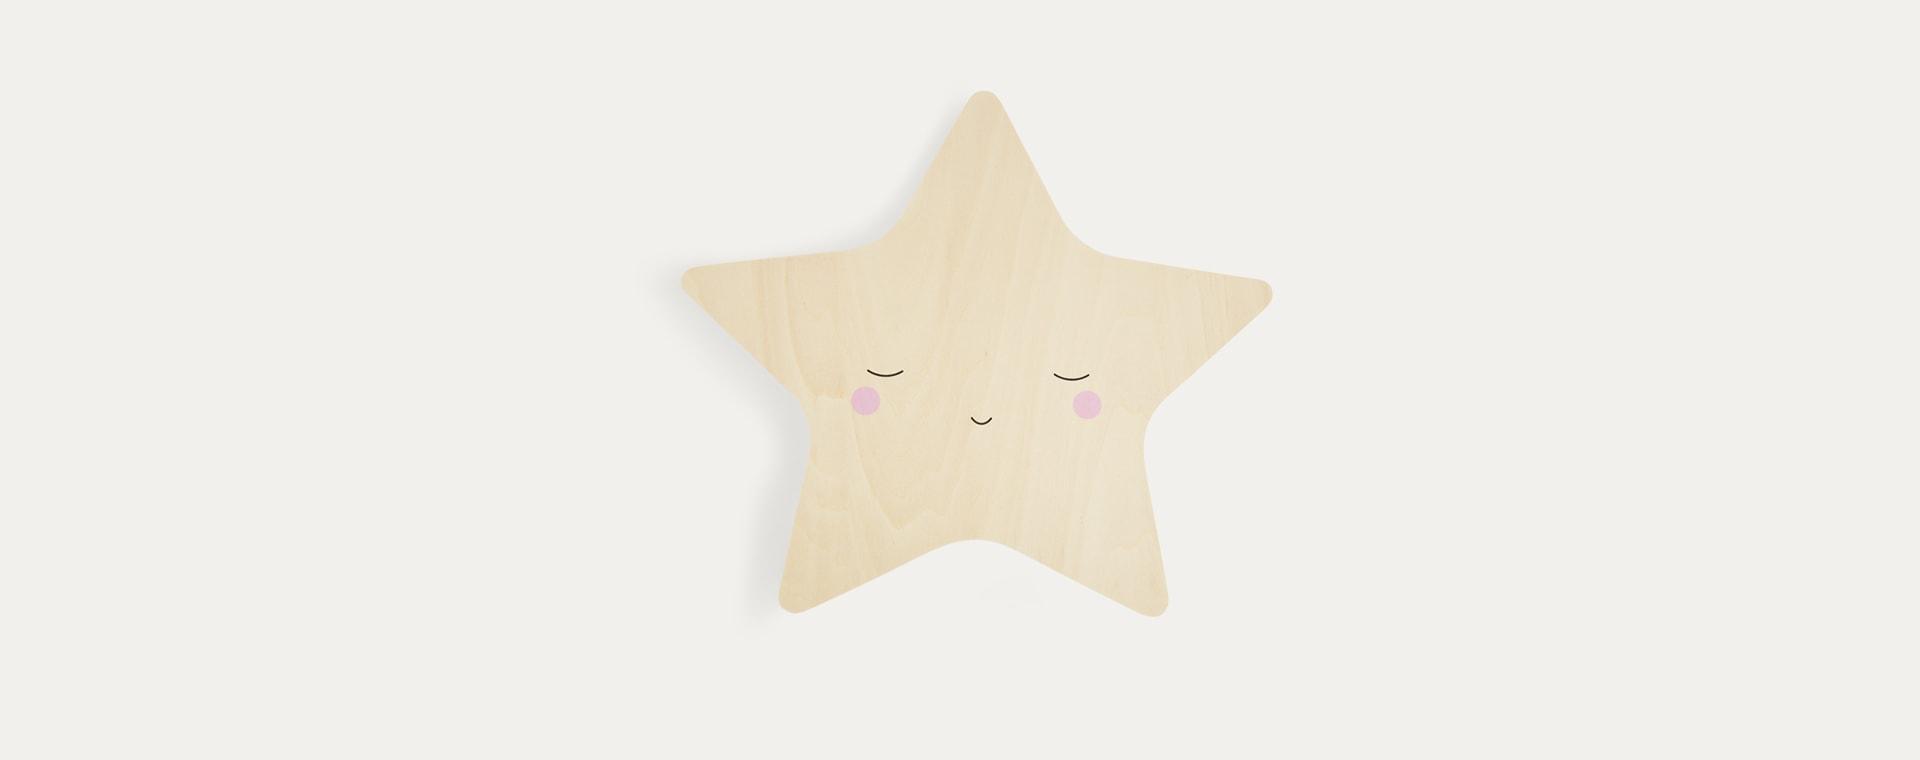 Neutral Lello Silhouette Star Tap Night Light